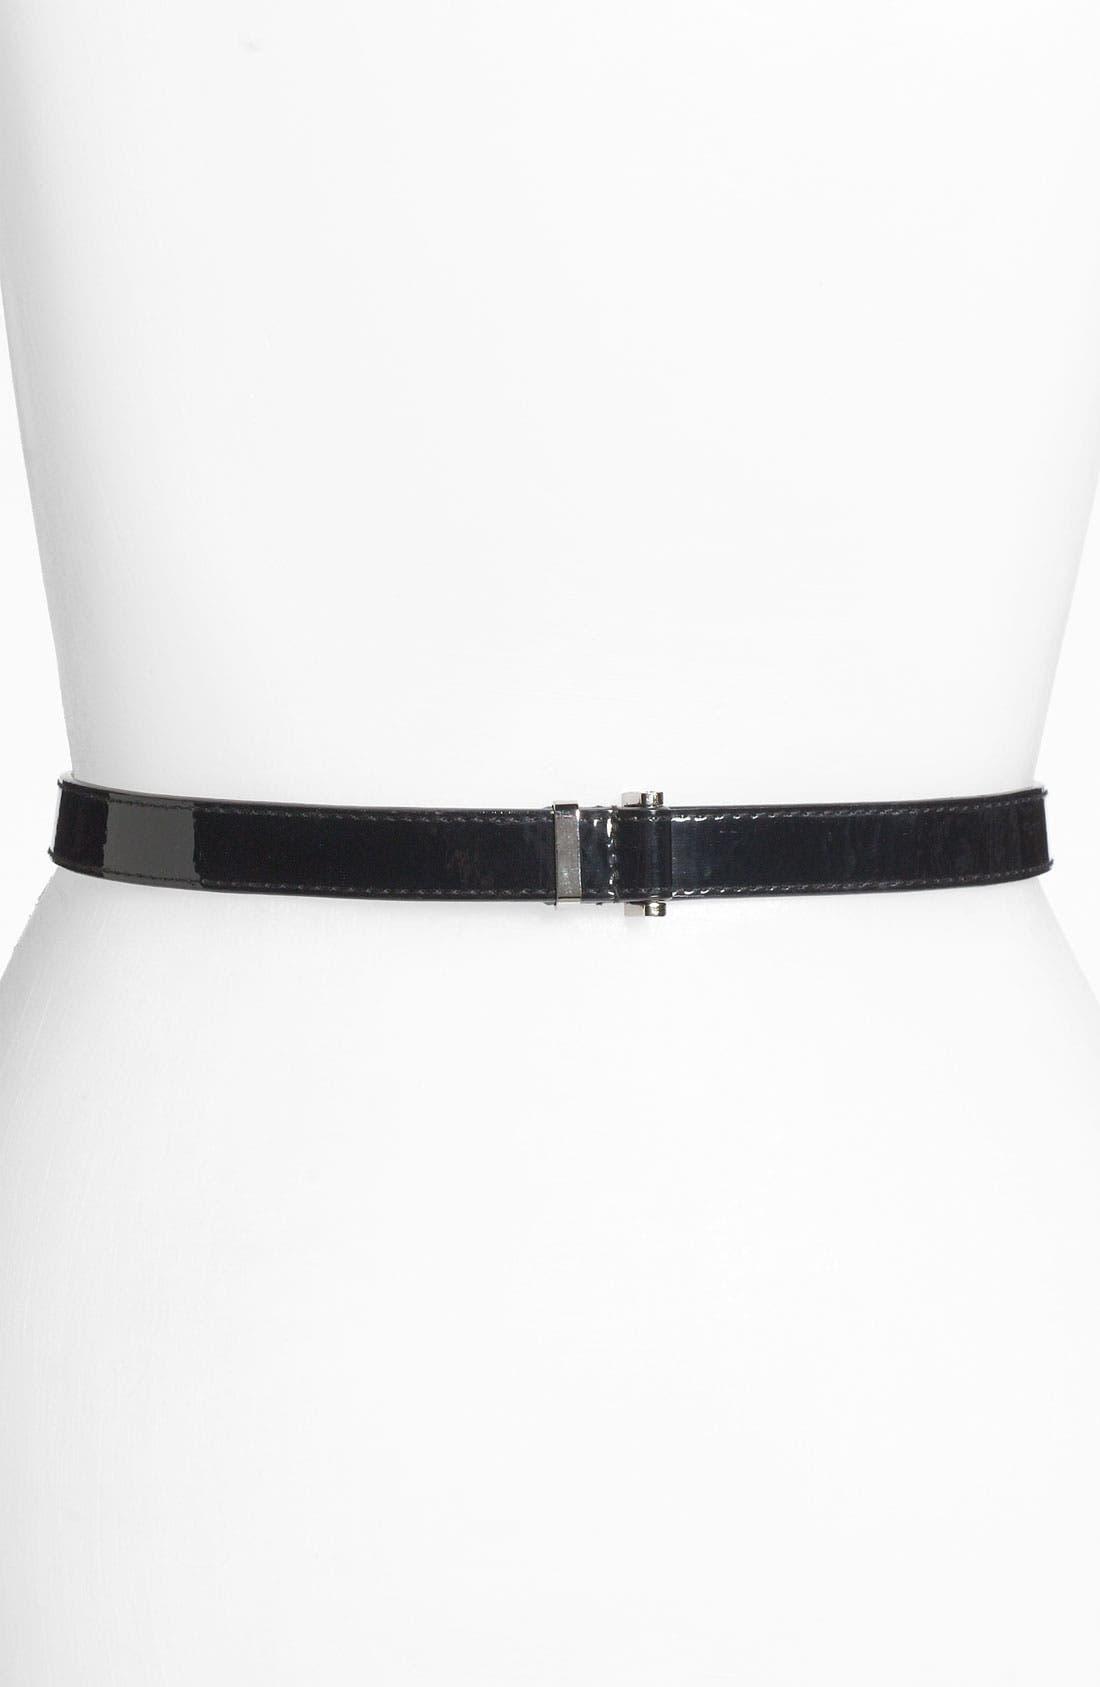 Main Image - WCM Patent Toggle Belt